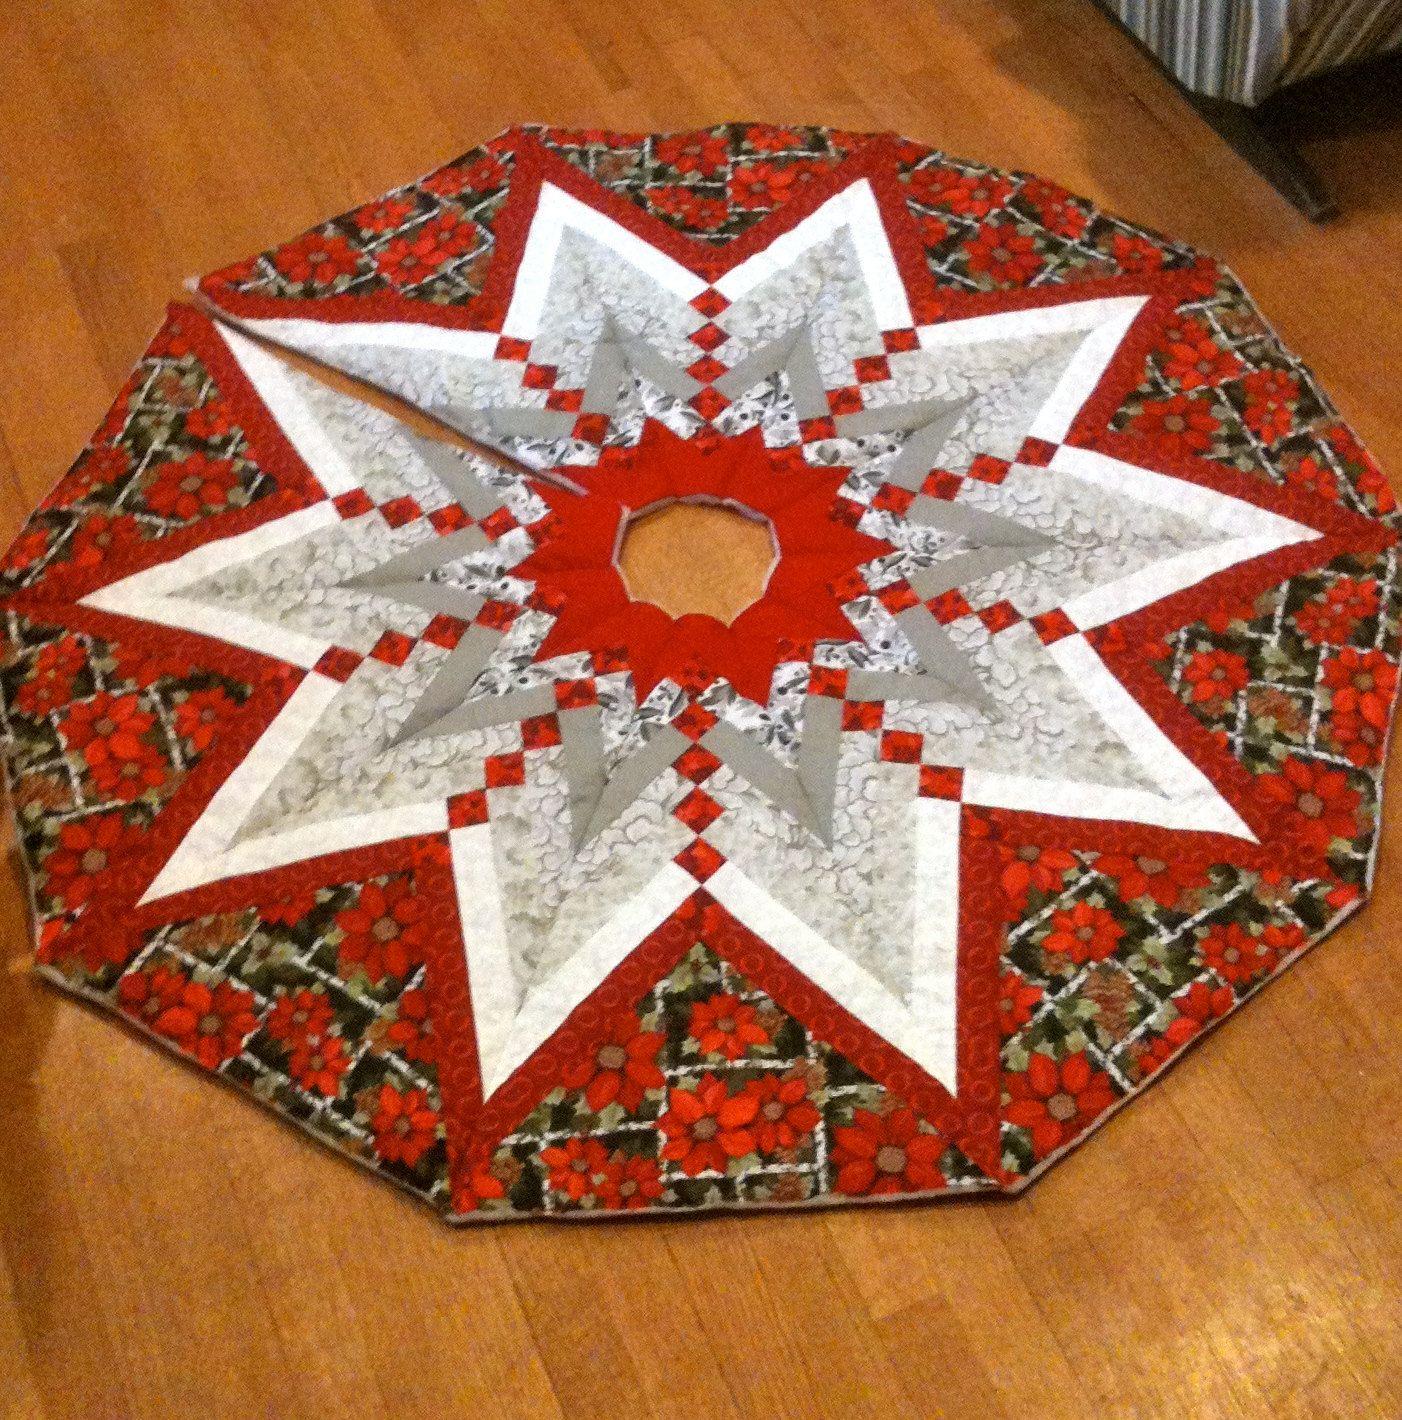 Christmas Tree Skirt Quilt Patterns Interesting Ideas